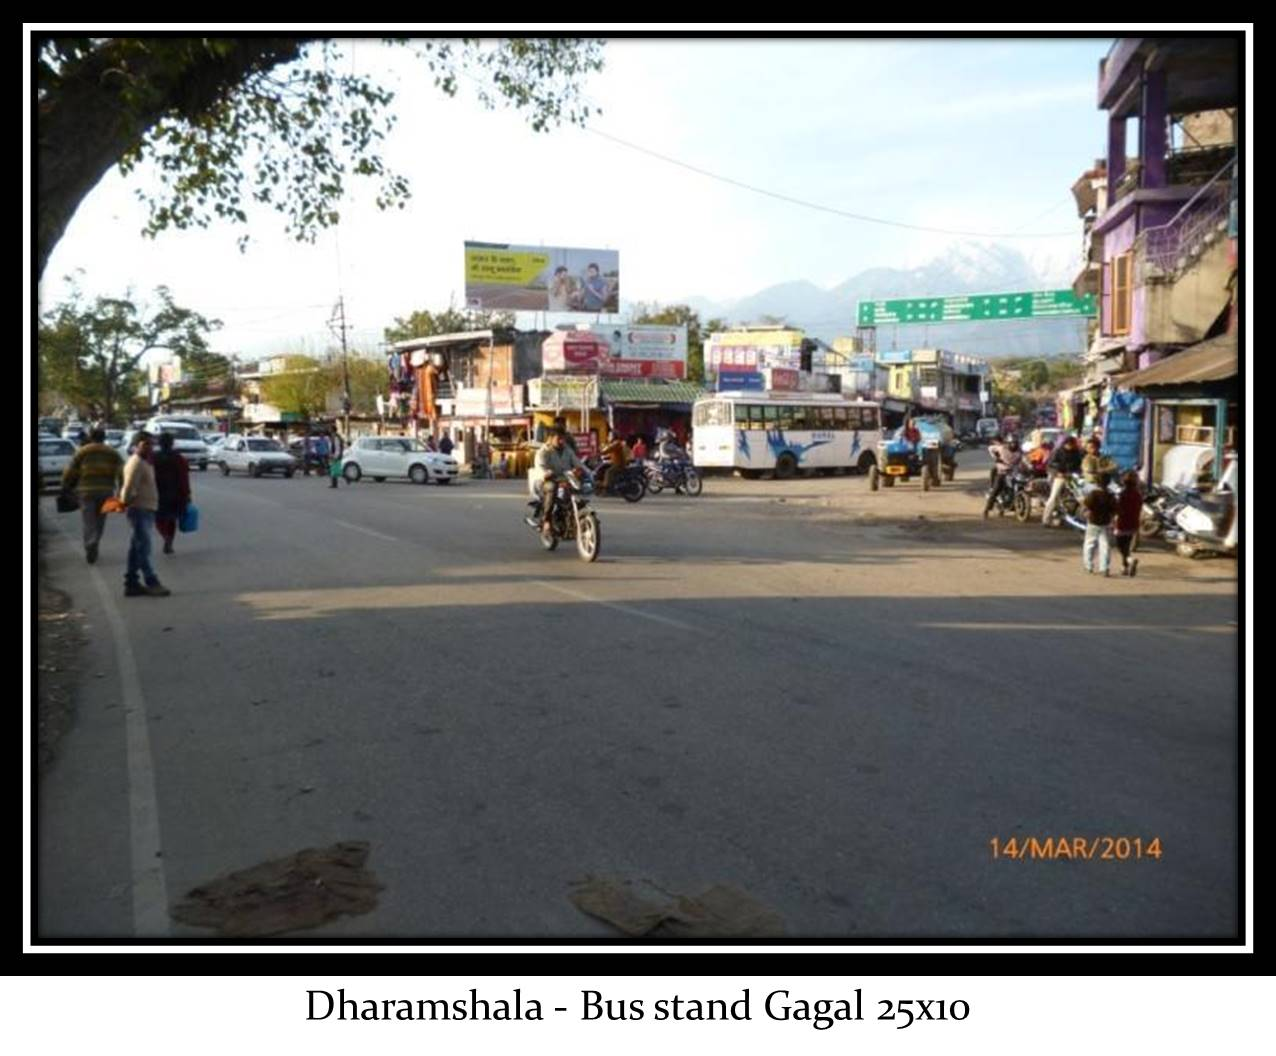 Bus stand Gagal, Dharamshala